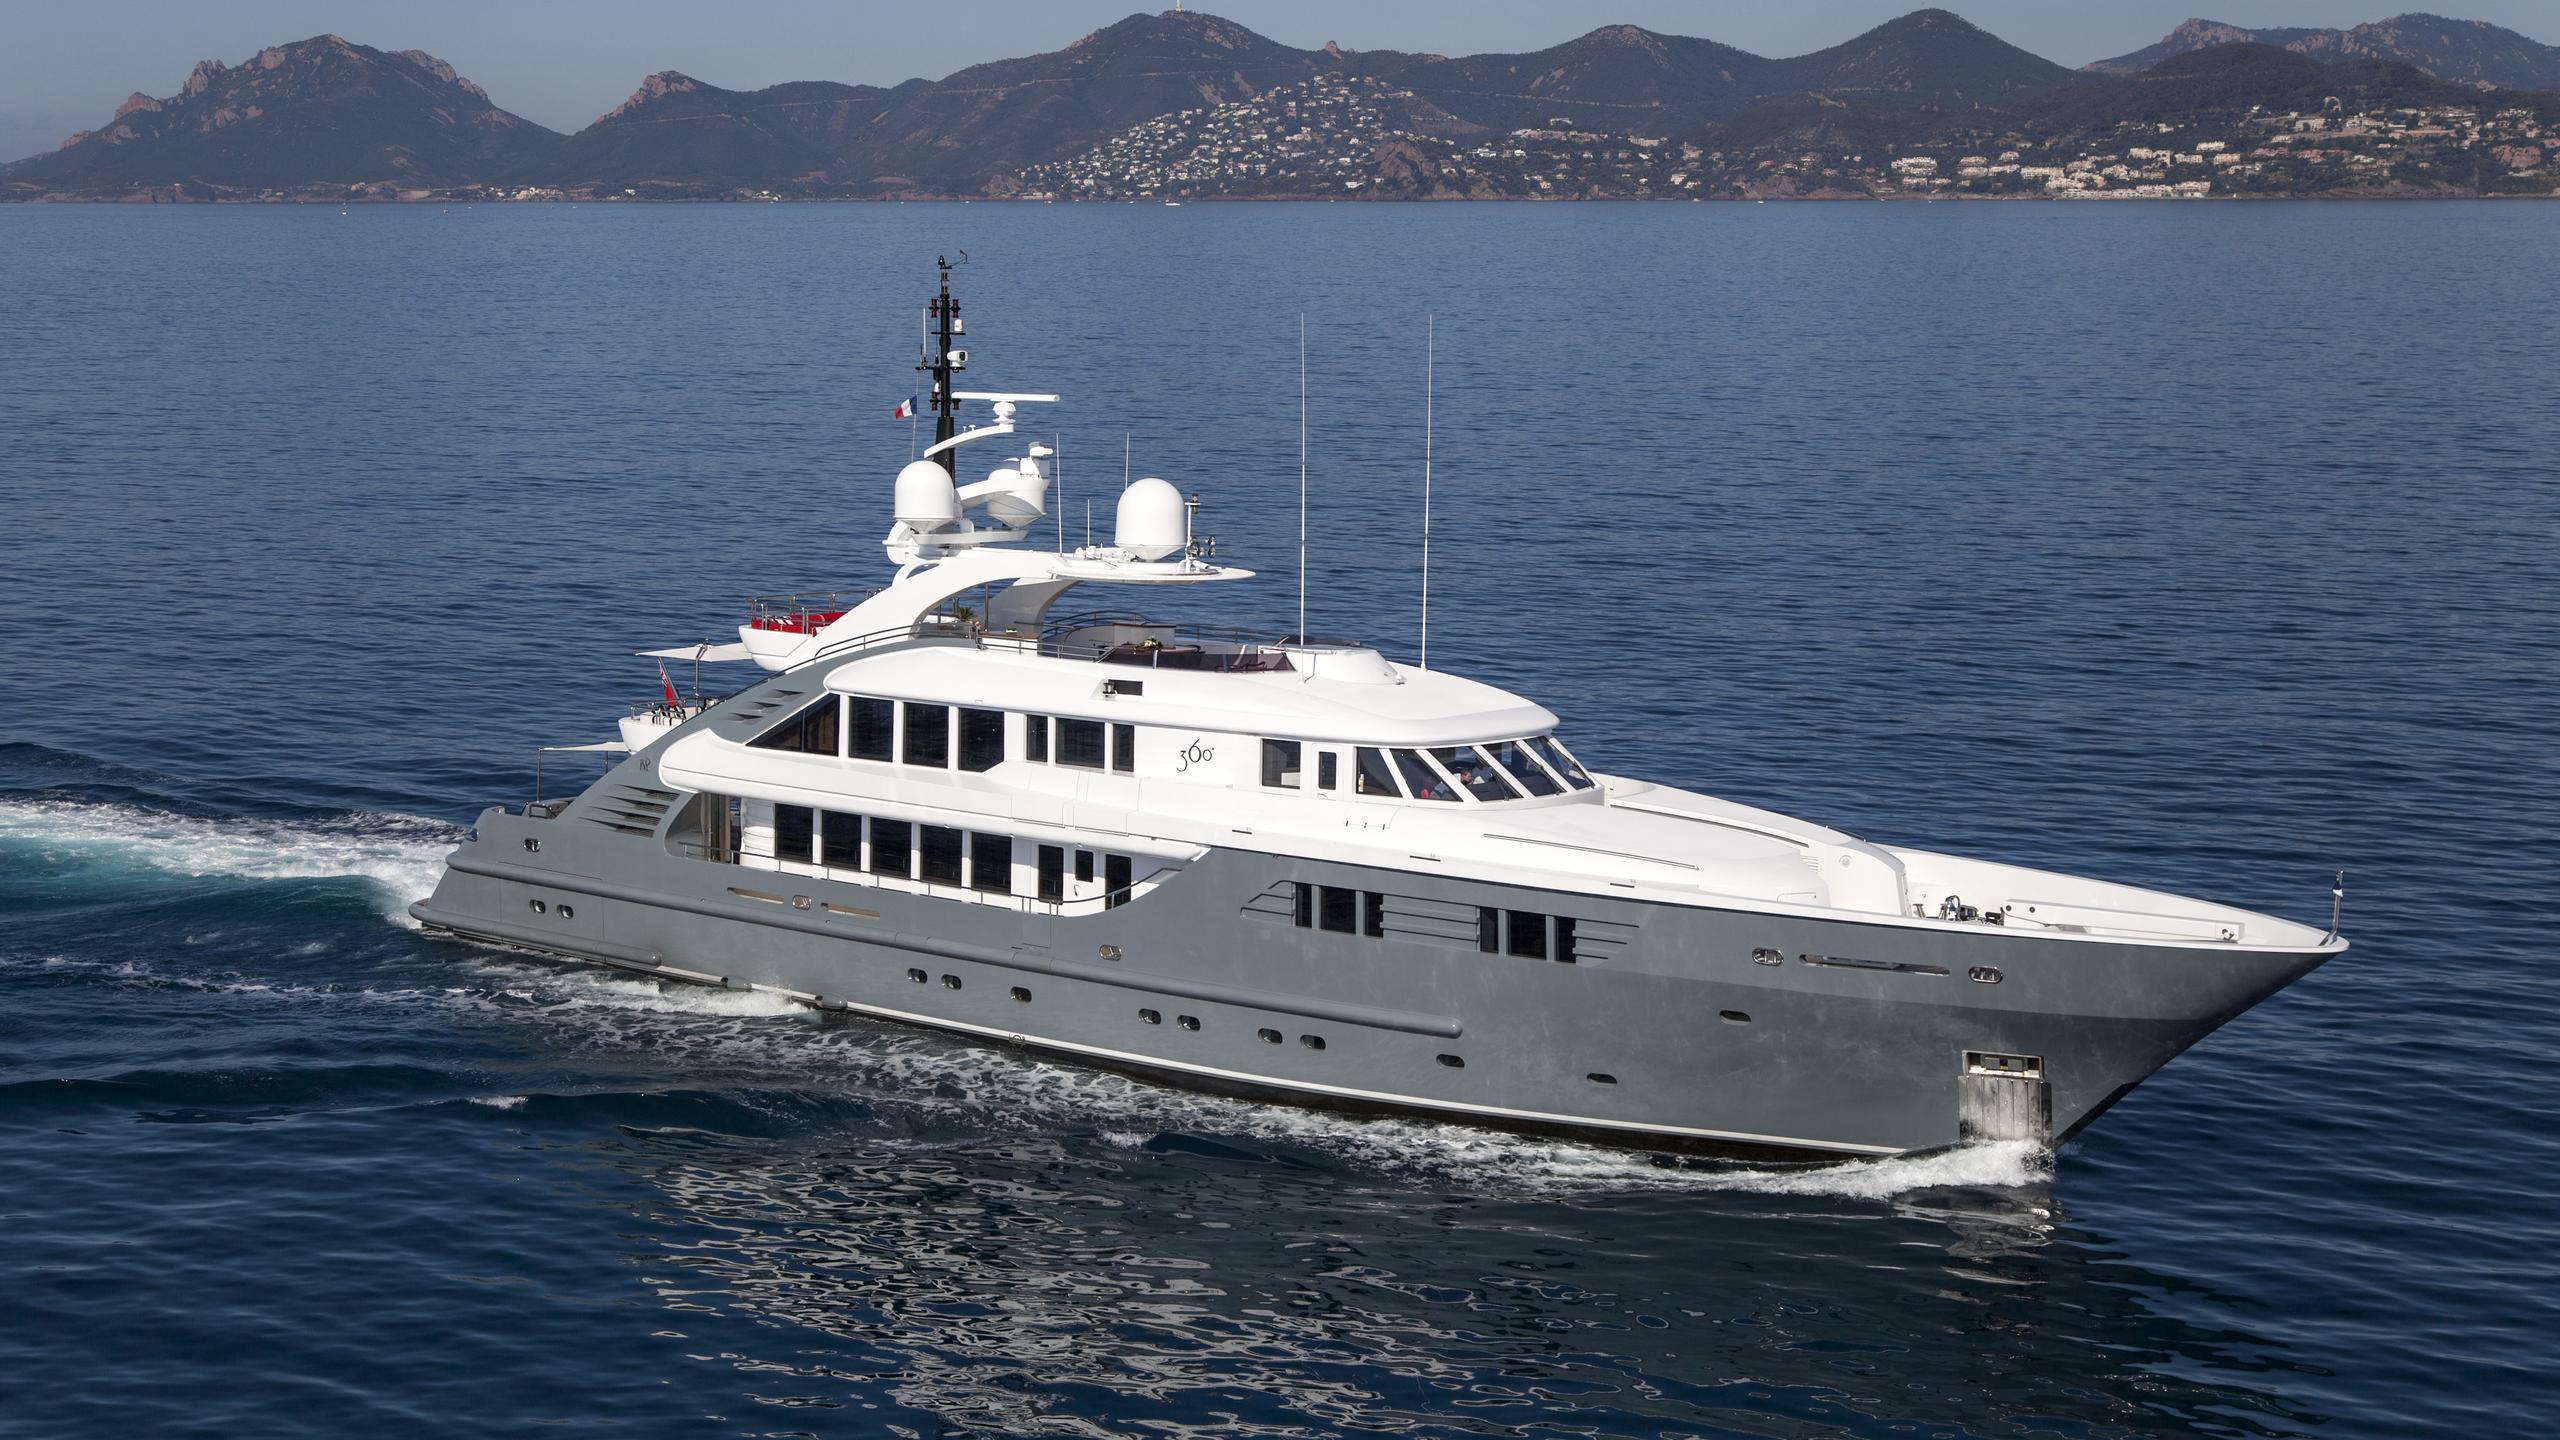 lady mm 360 sonka motoryacht isa yachts 47m 2003 half profile